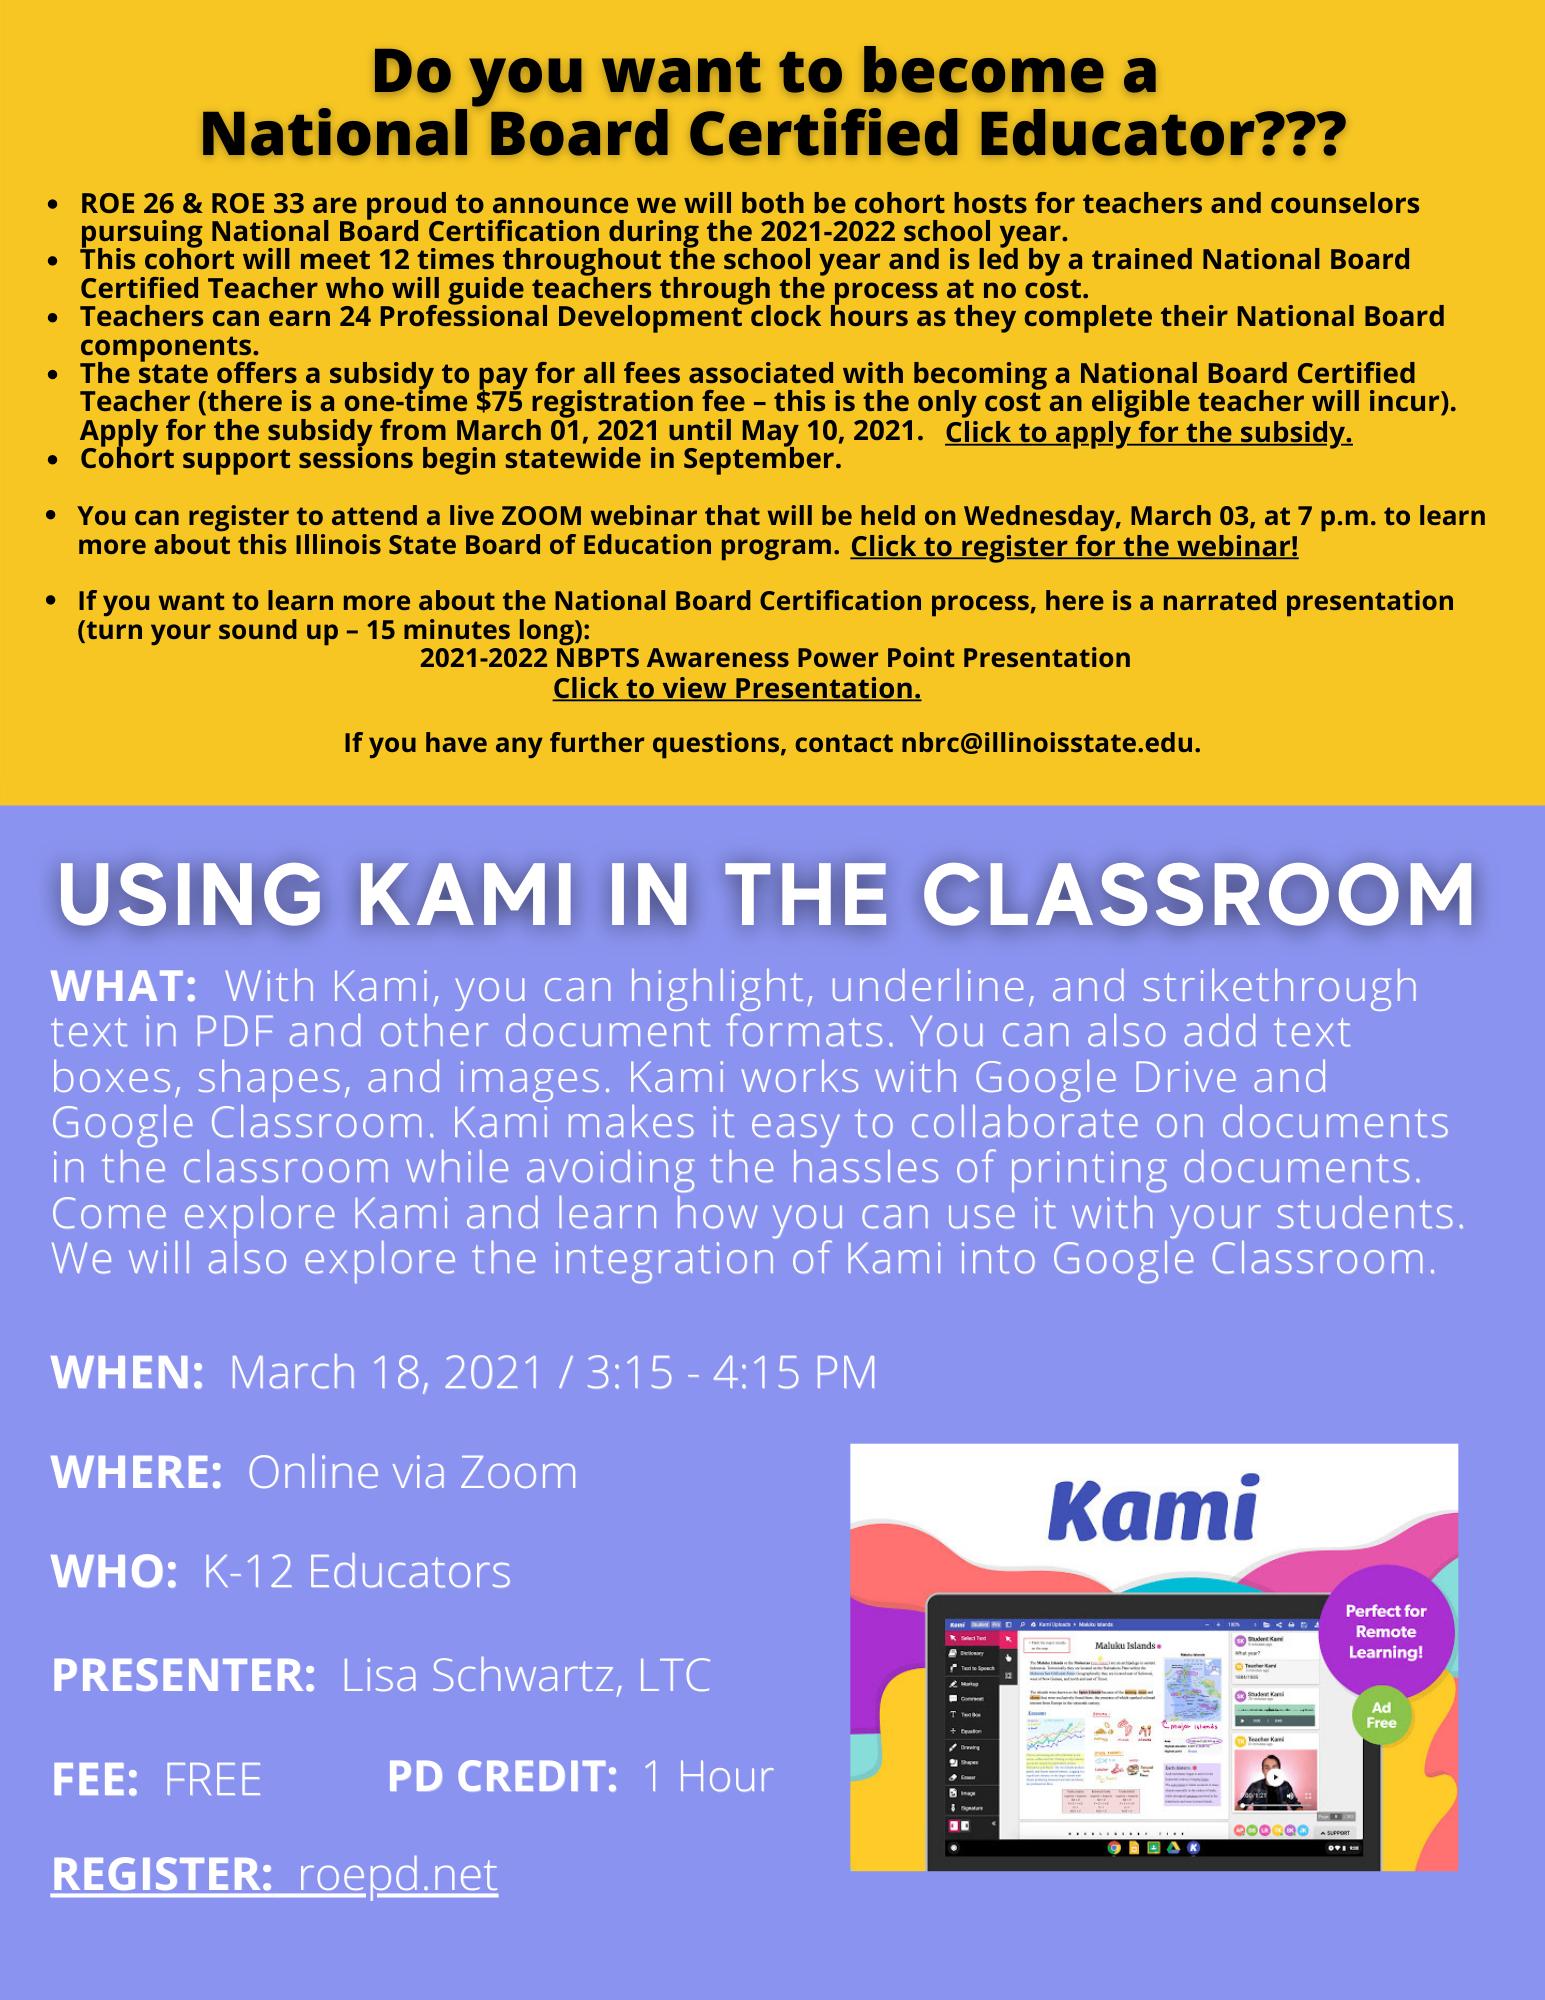 Kami in the Classroom